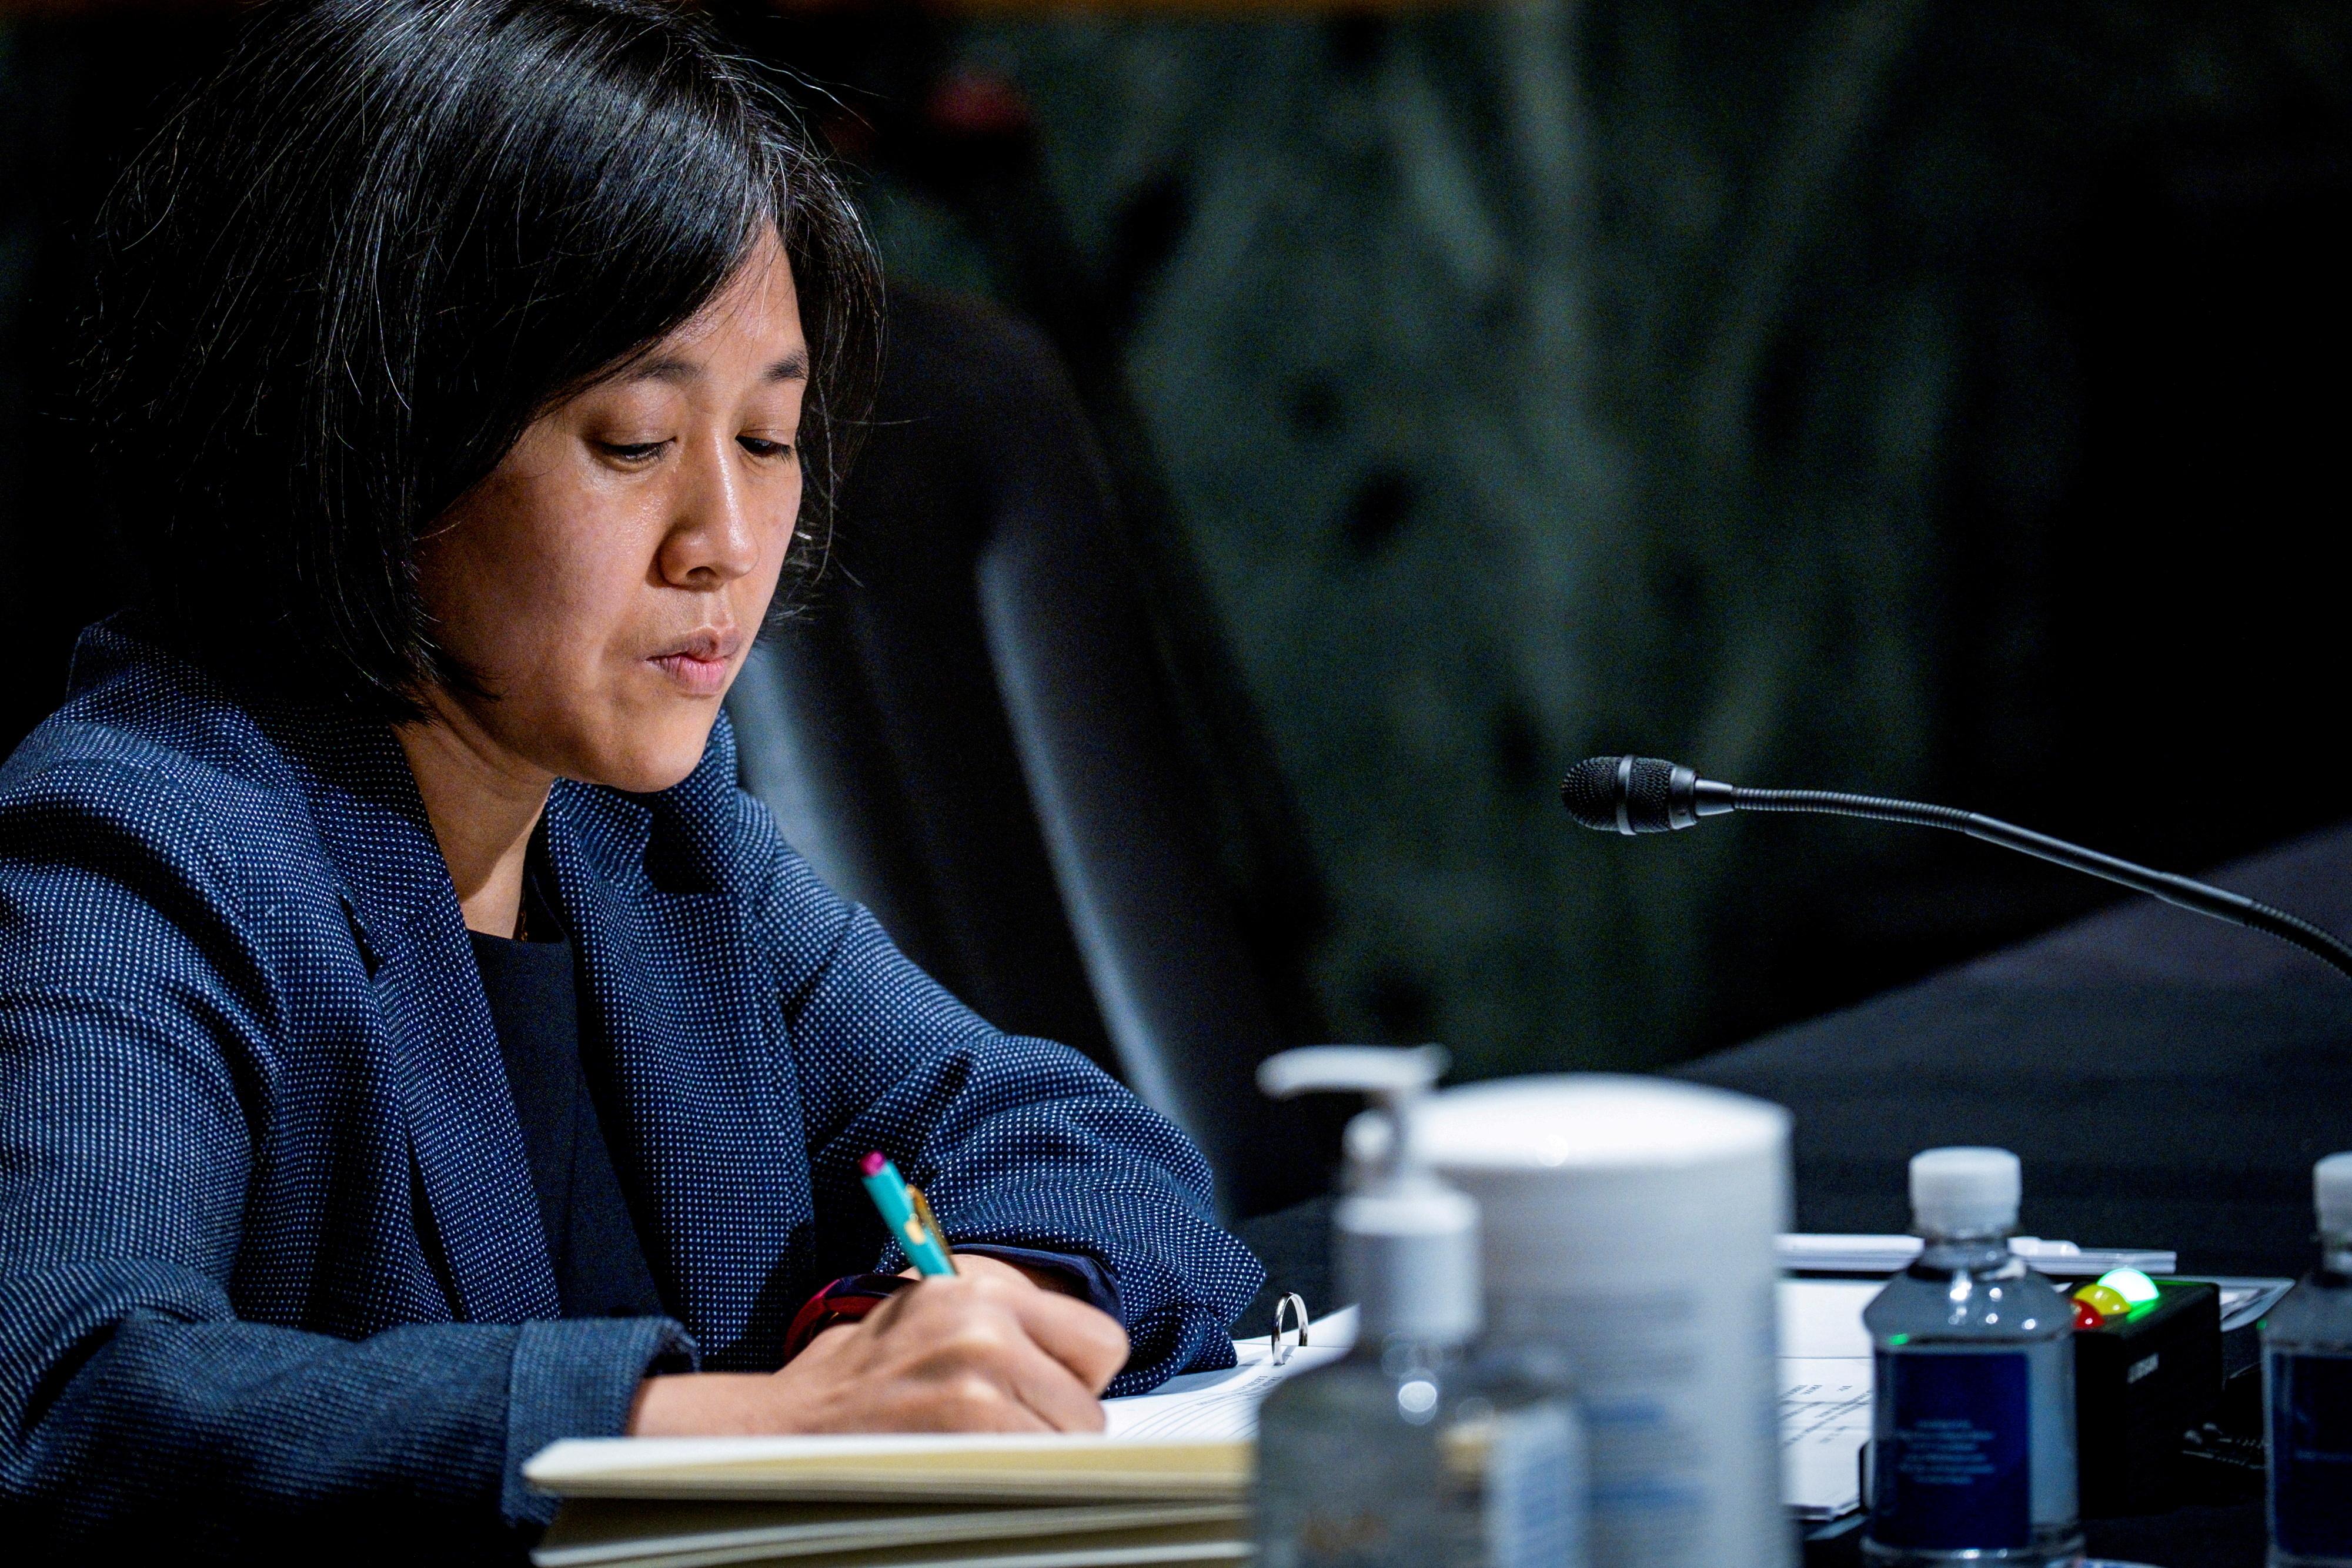 U.S. Trade Representative Katherine Tai testifies before the Senate Finance Committee on Capitol Hill in Washington, U.S., May 12, 2021. Pete Marovich/Pool via REUTERS/File Photo